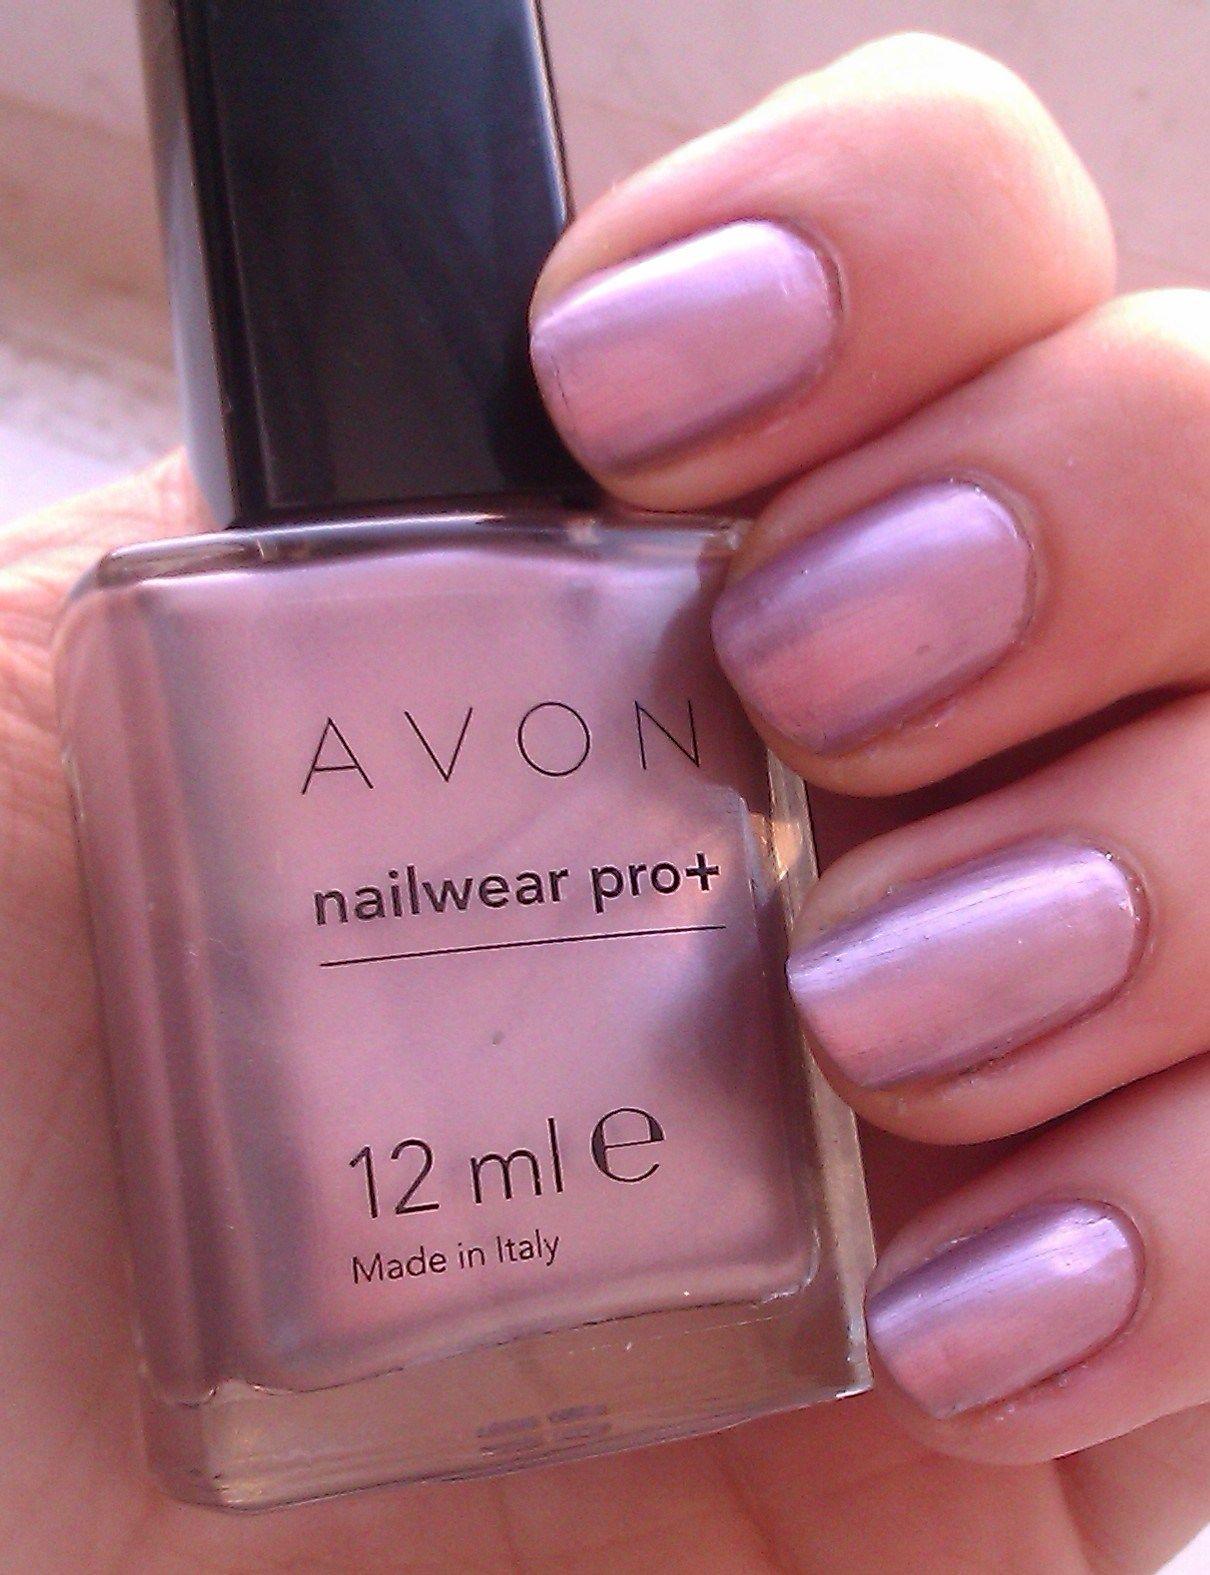 Esmalte 5 em 1 Avon Nailwear Pro+ cor Nude Chic